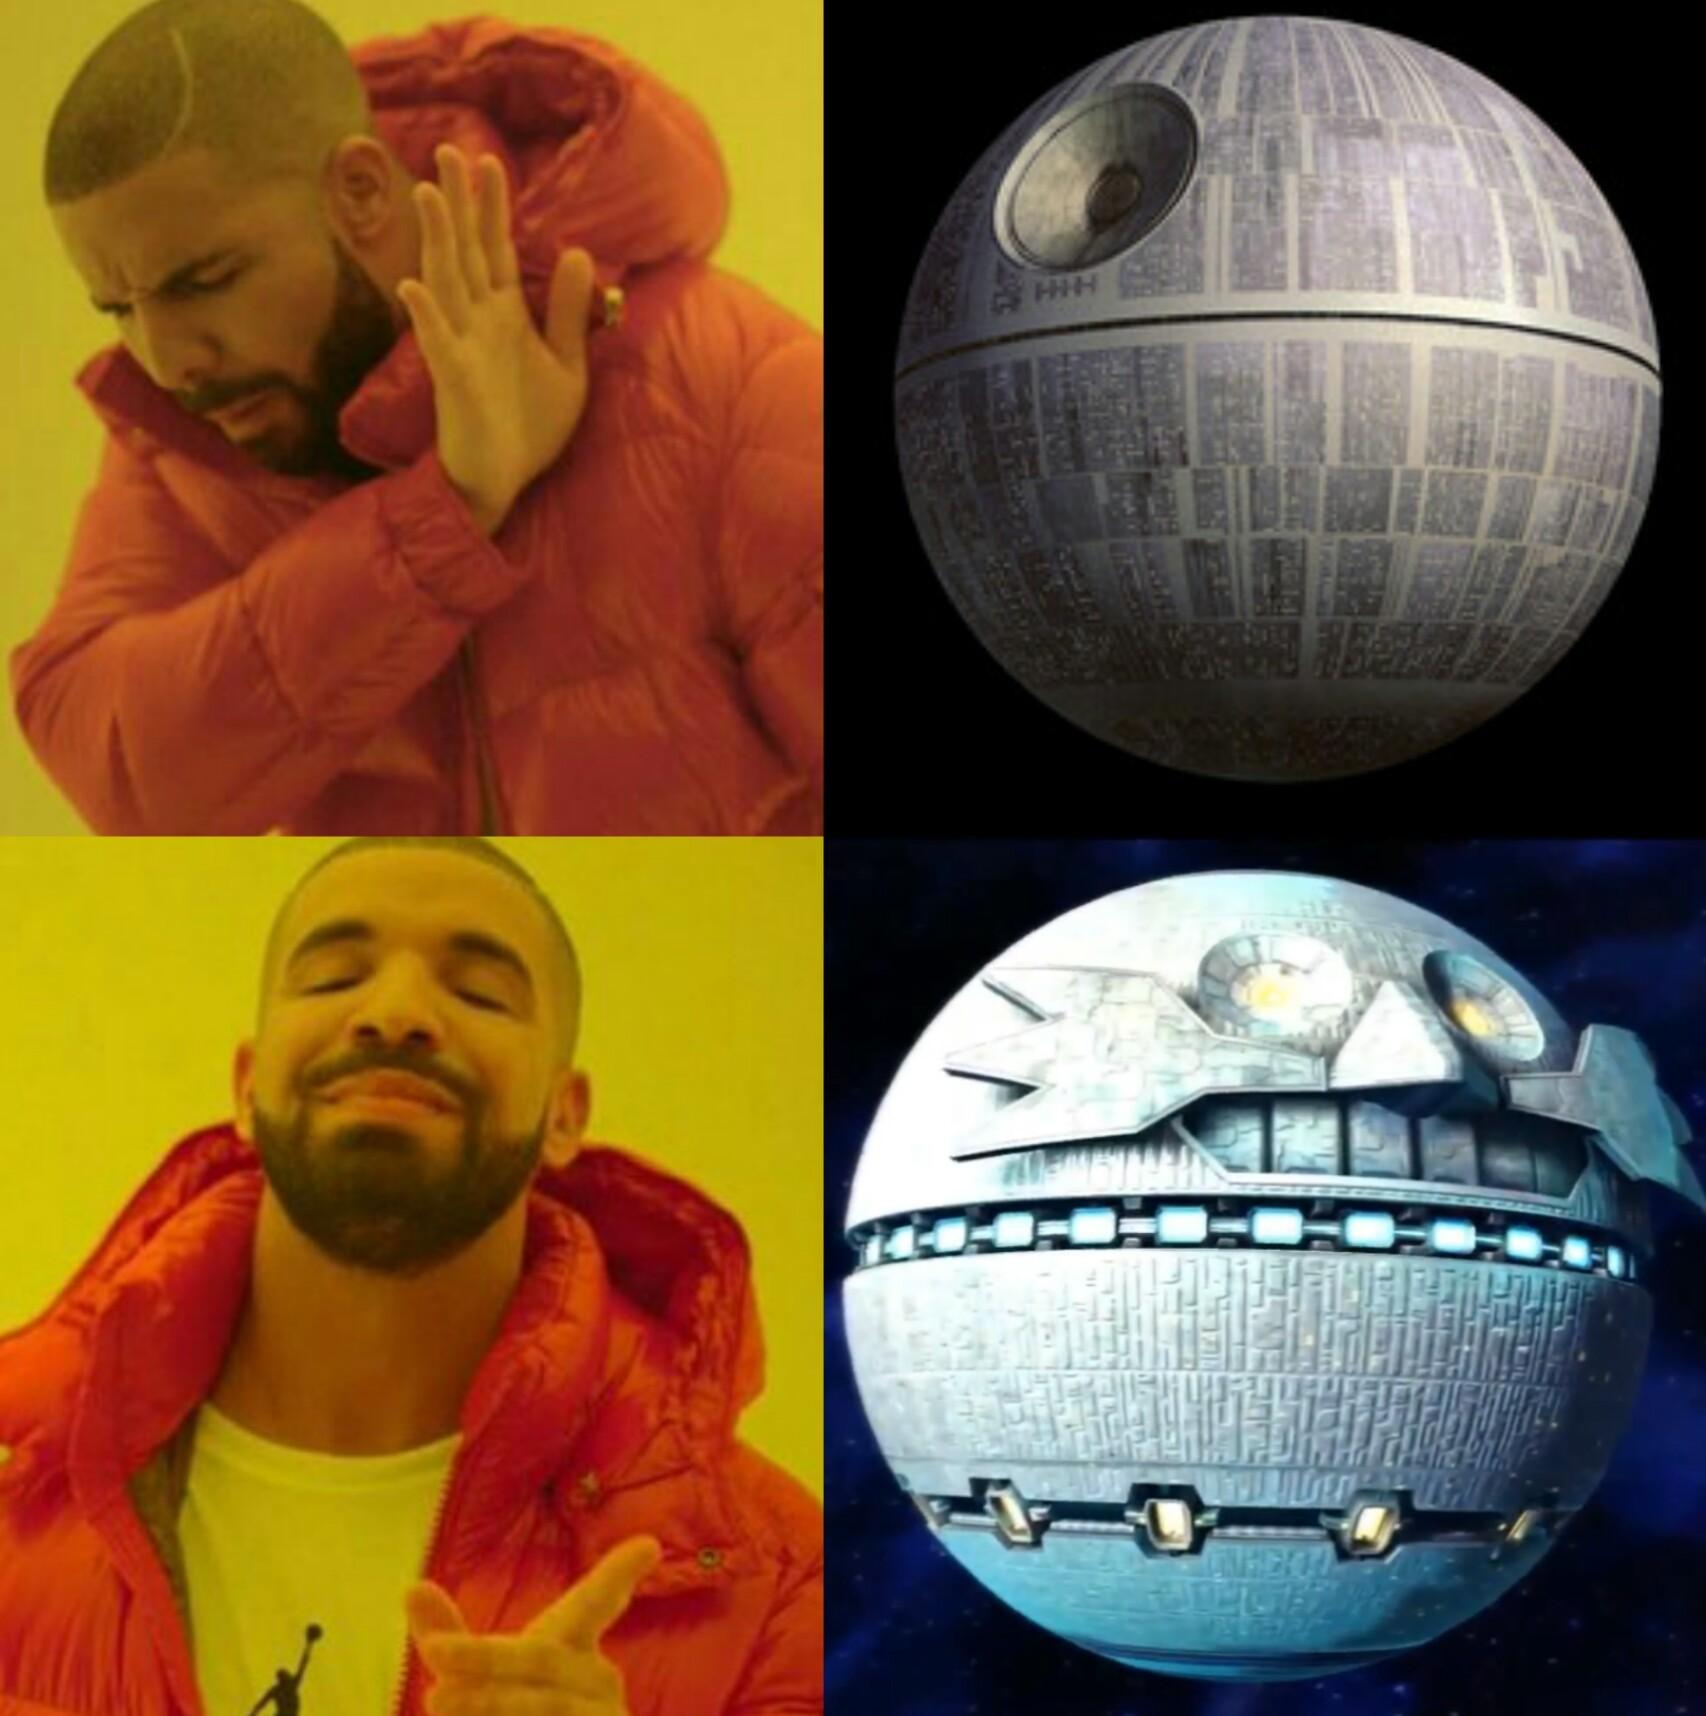 Copyright law evation 100% - meme